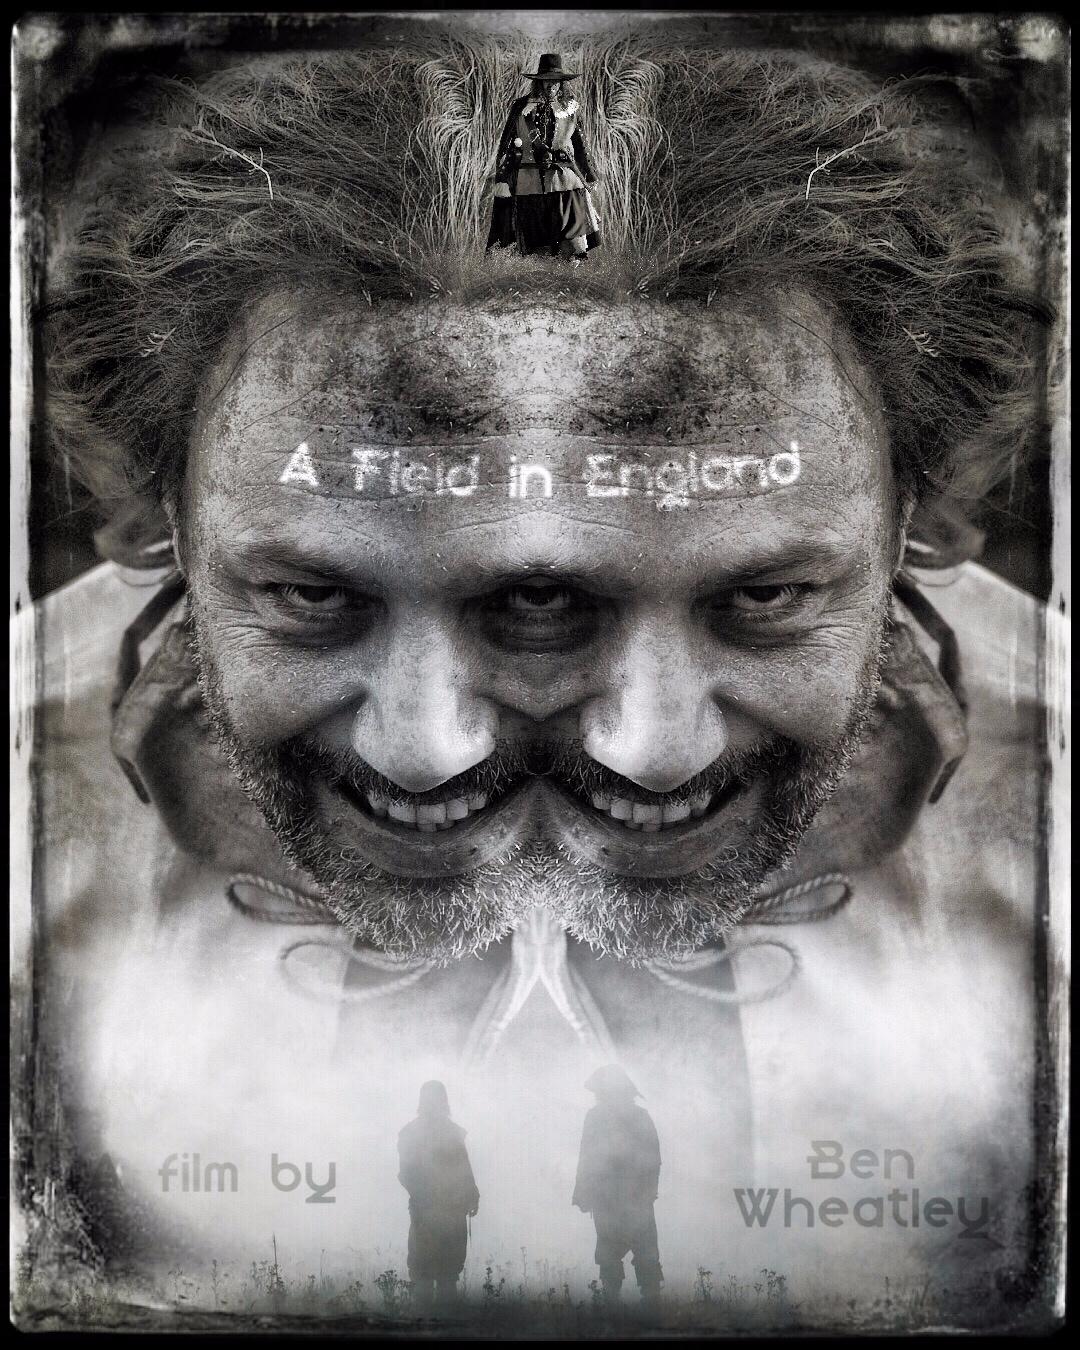 Field England poster design var - pinheiro | ello